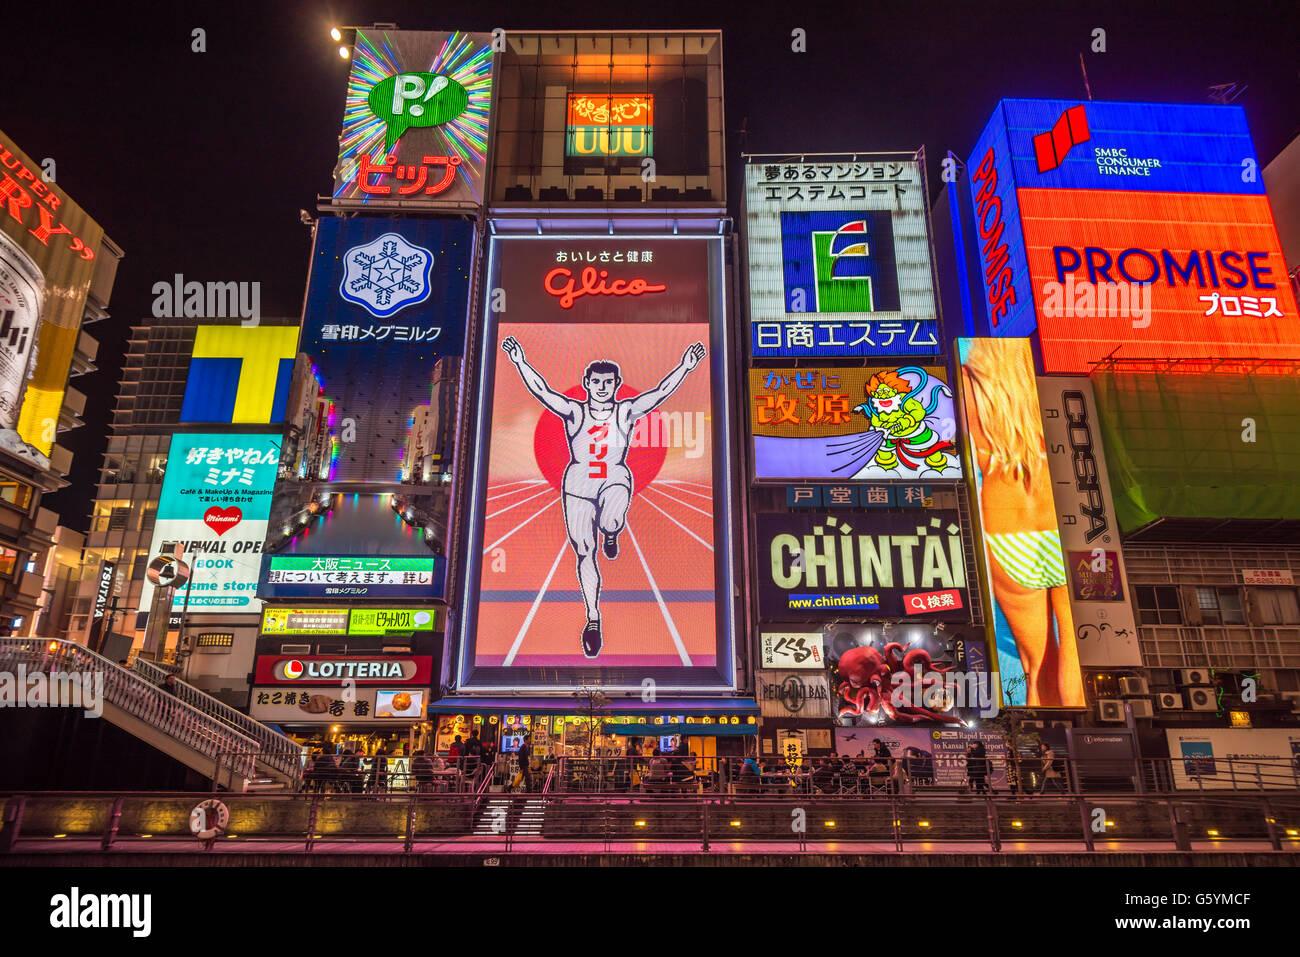 OSAKA, Japón - Noviembre 15, 2014: hombre Glico cartel de neón en el distrito de Dotonbori, Osaka Imagen De Stock